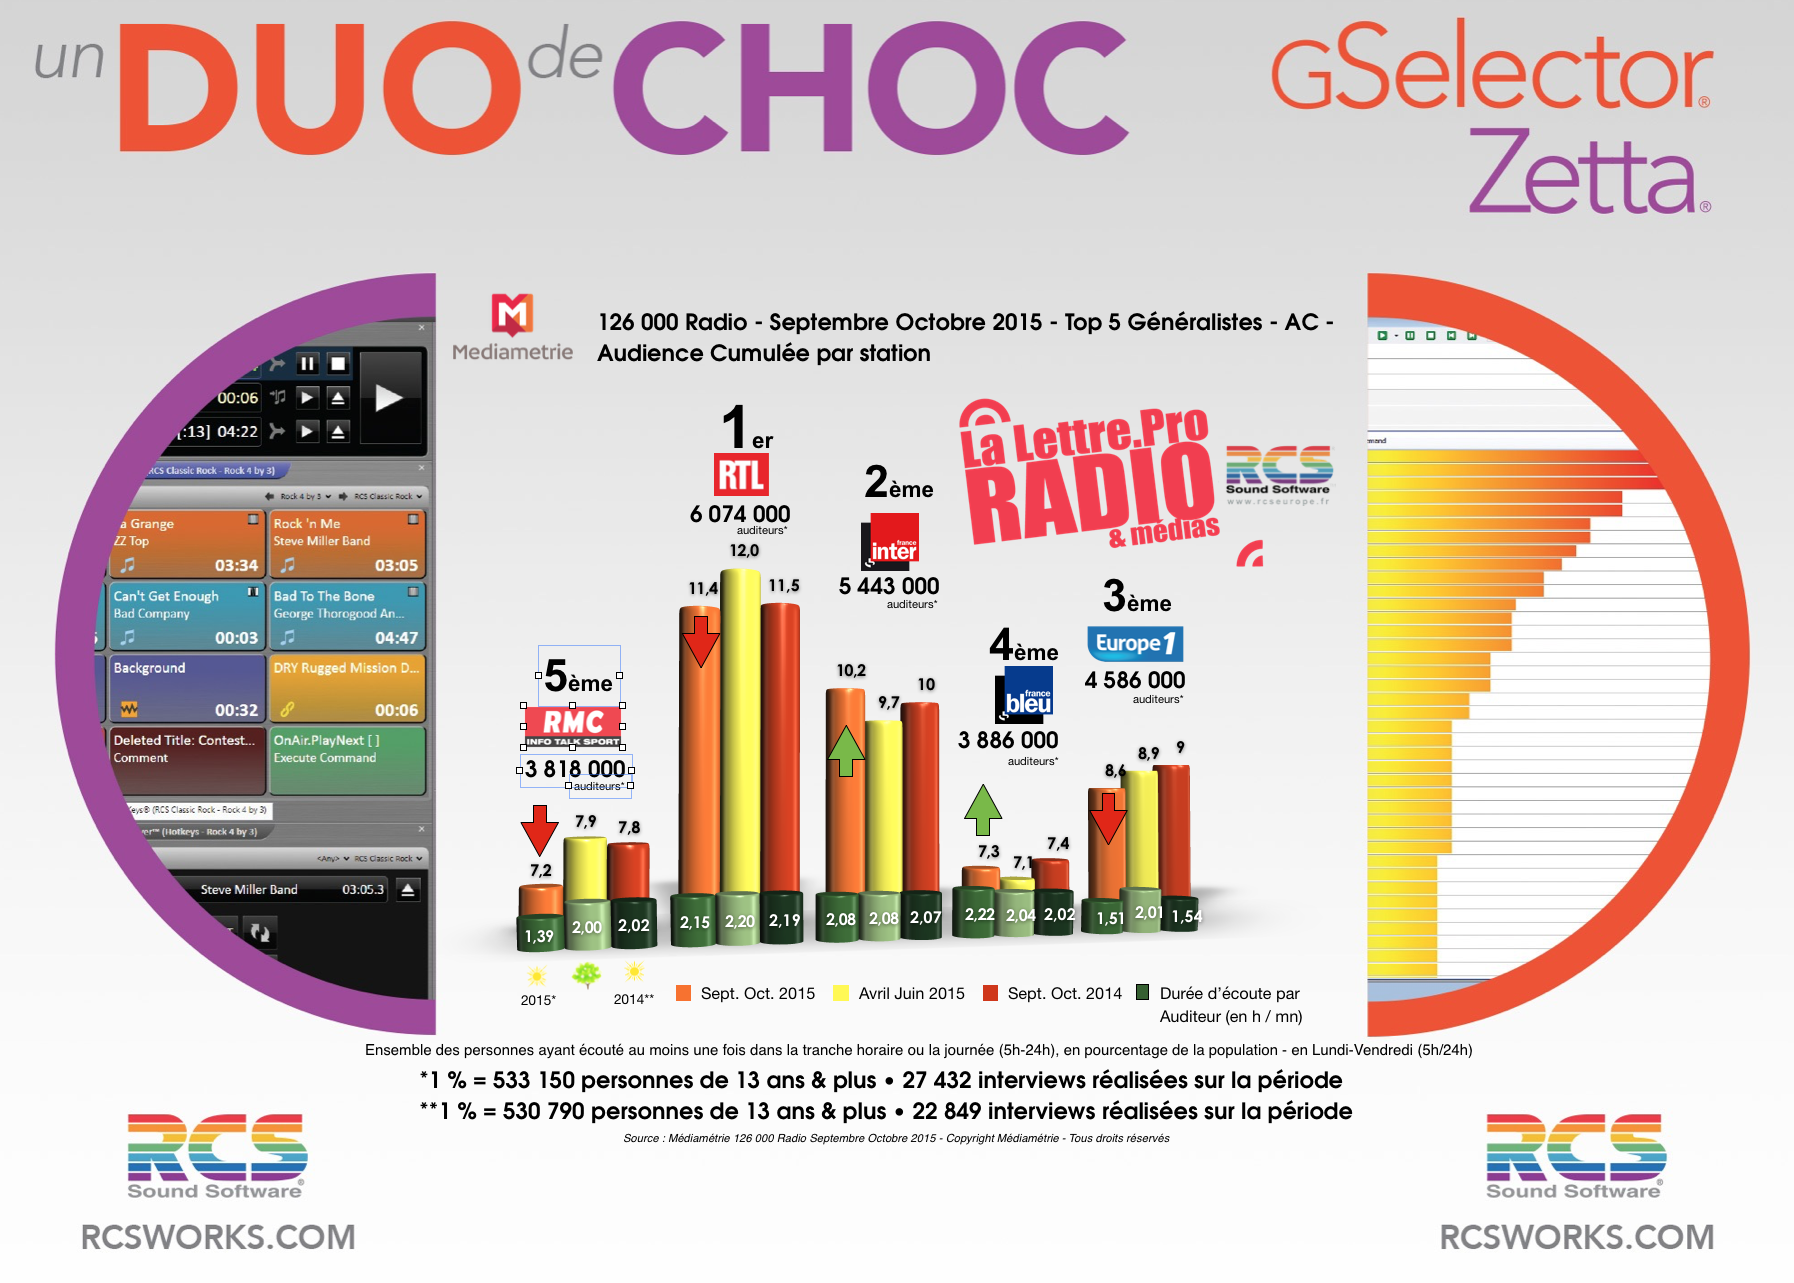 Diagramme exclusif LLP/RCS GSelector 4 - TOP 5 radios Généralistes en Lundi-Vendredi - 126 000 Radio Septembre-Octobre 2015